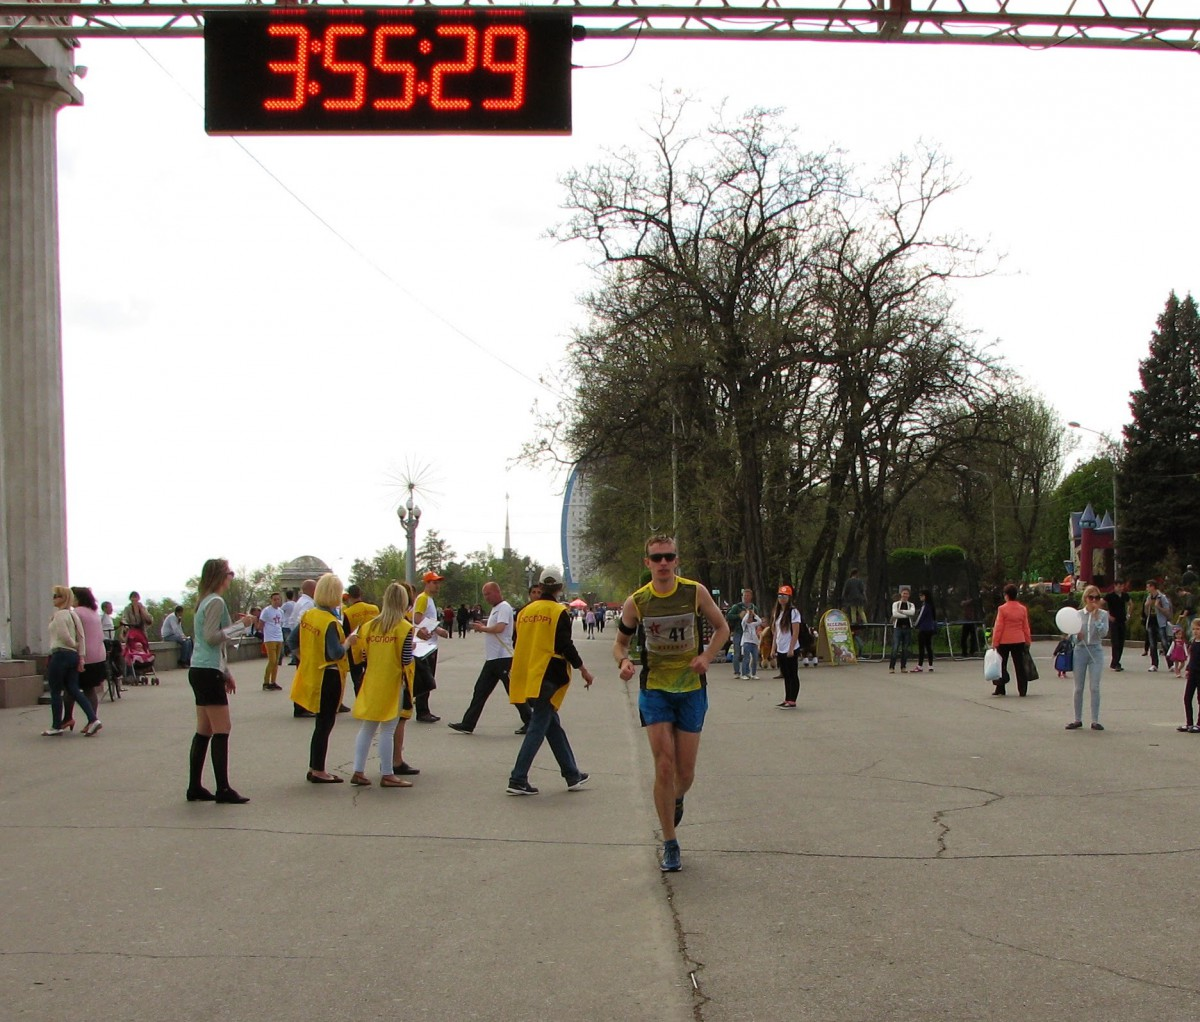 Финиш - Волгоградский международный марафон Победа 2015